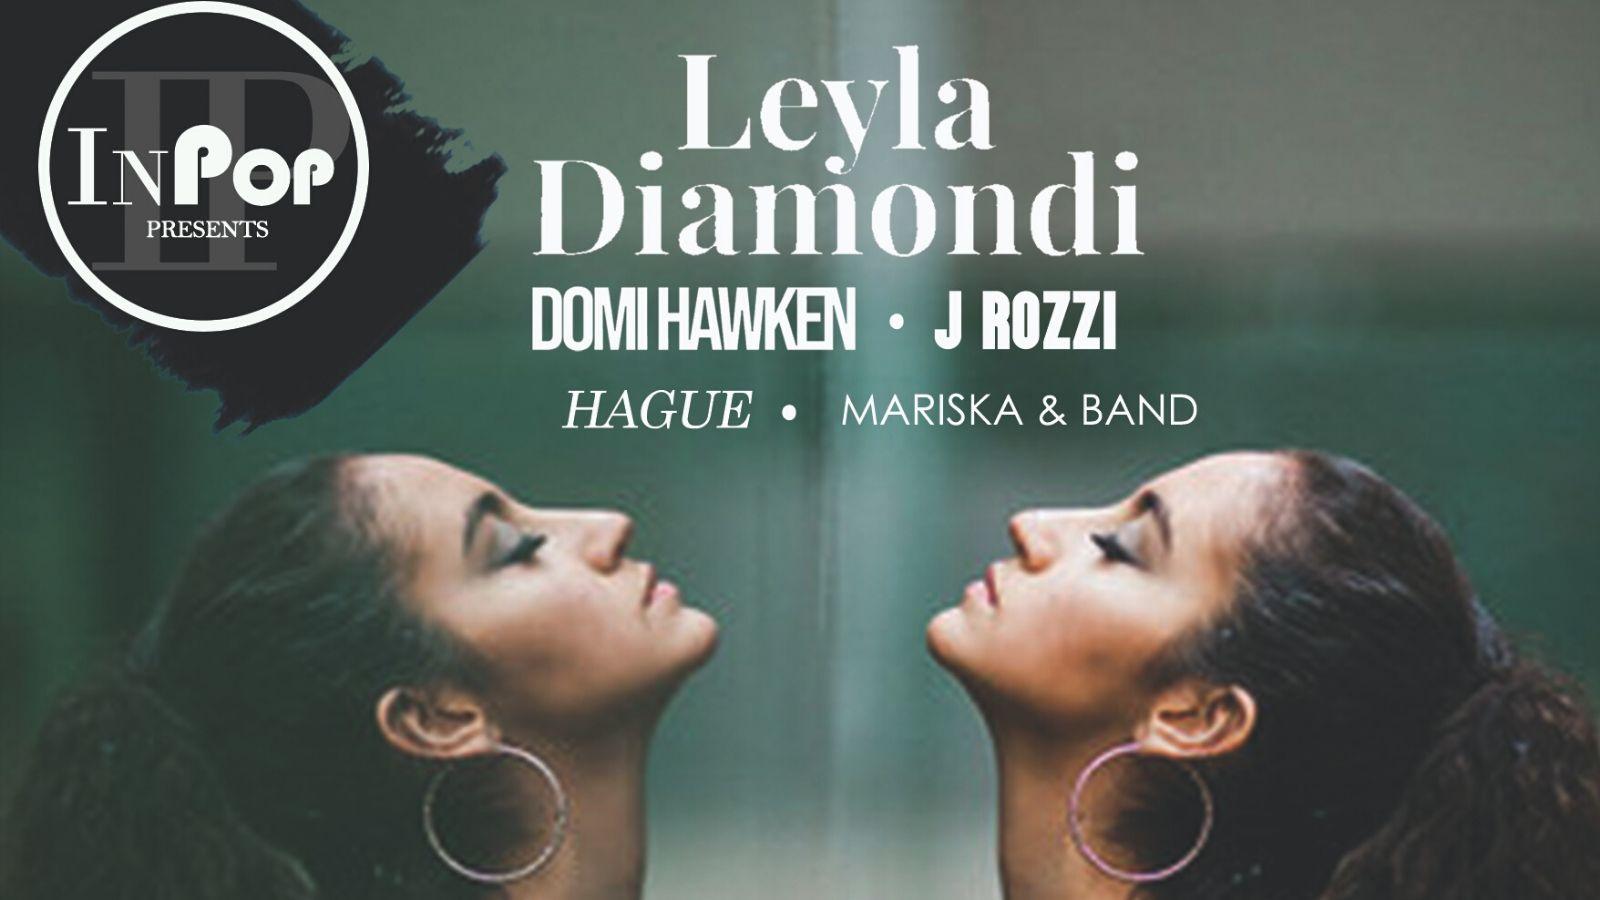 InPop Presents: Leyla Diamondi